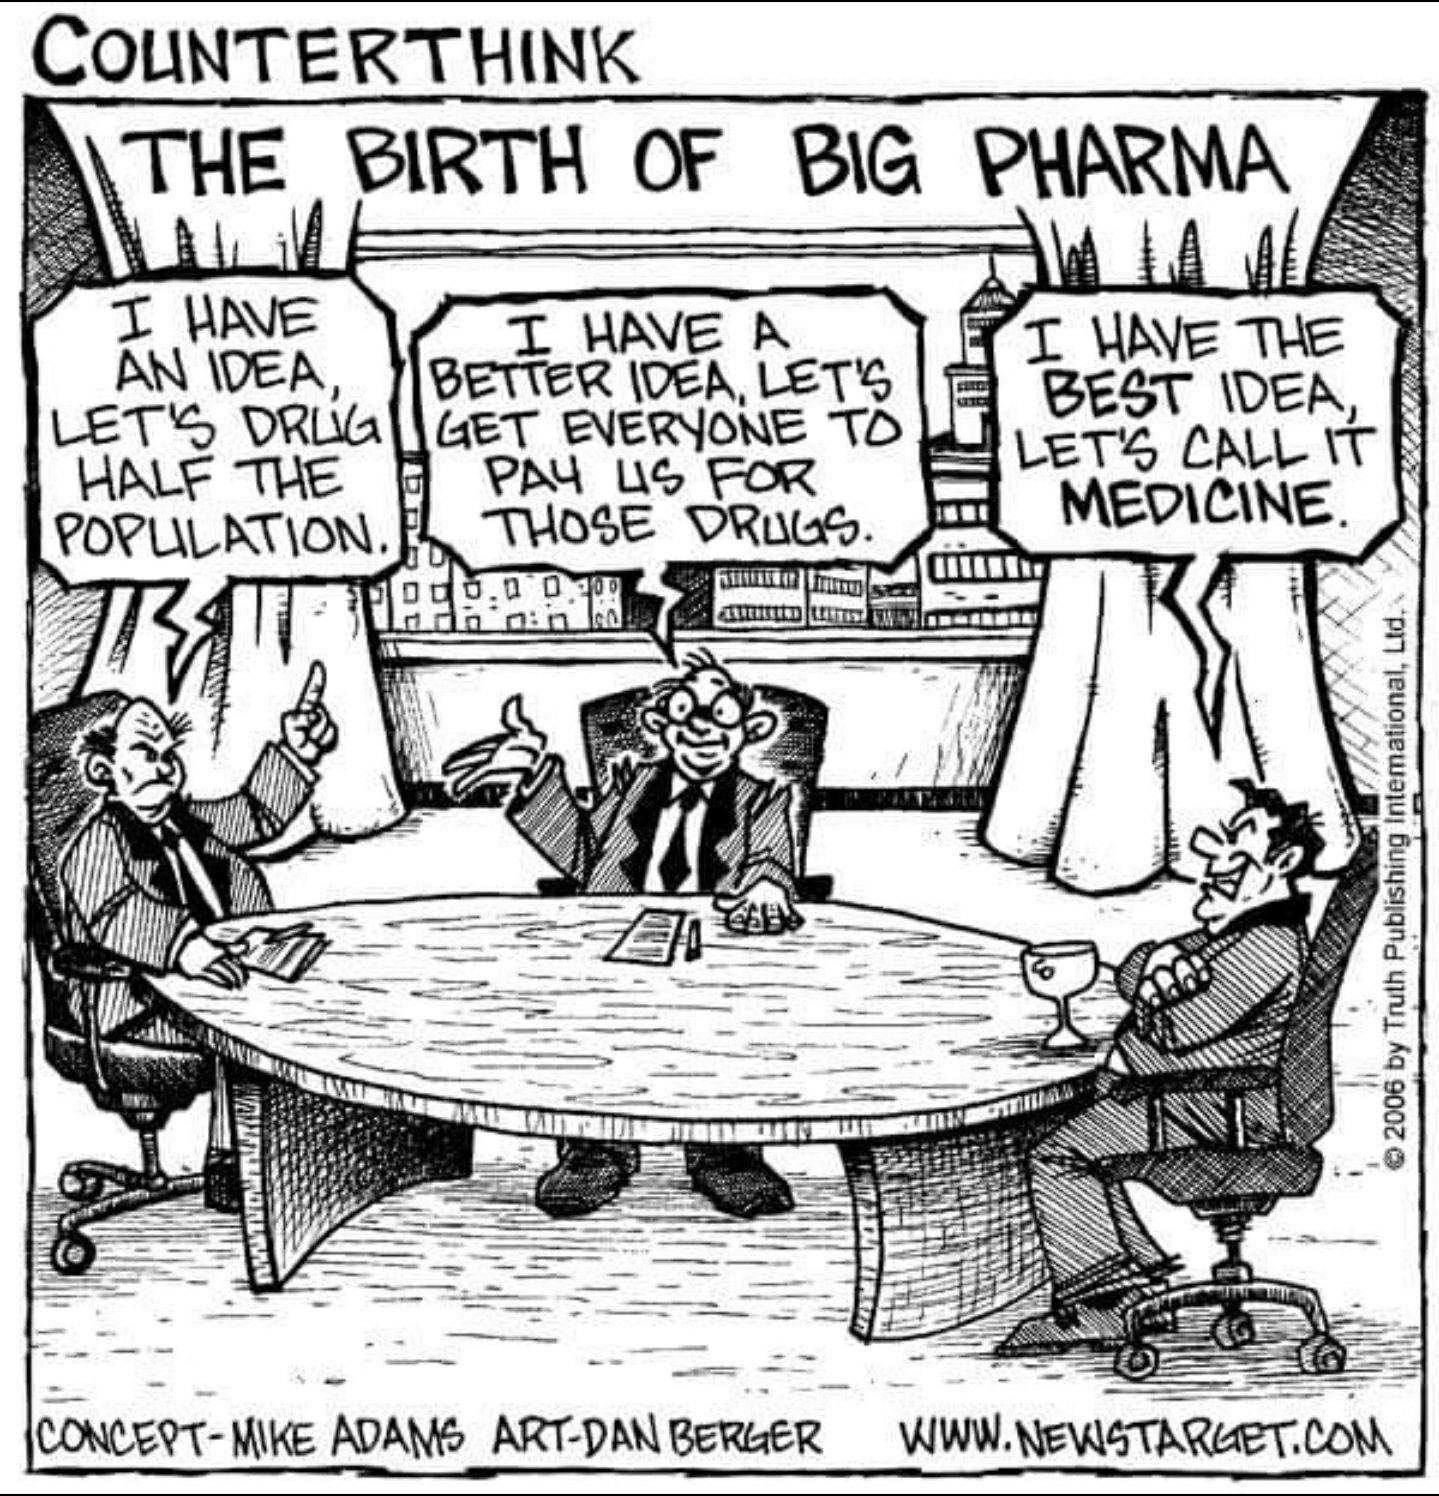 Big Pharma adalah industri untuk mengaut keuntungan berbilior dollar